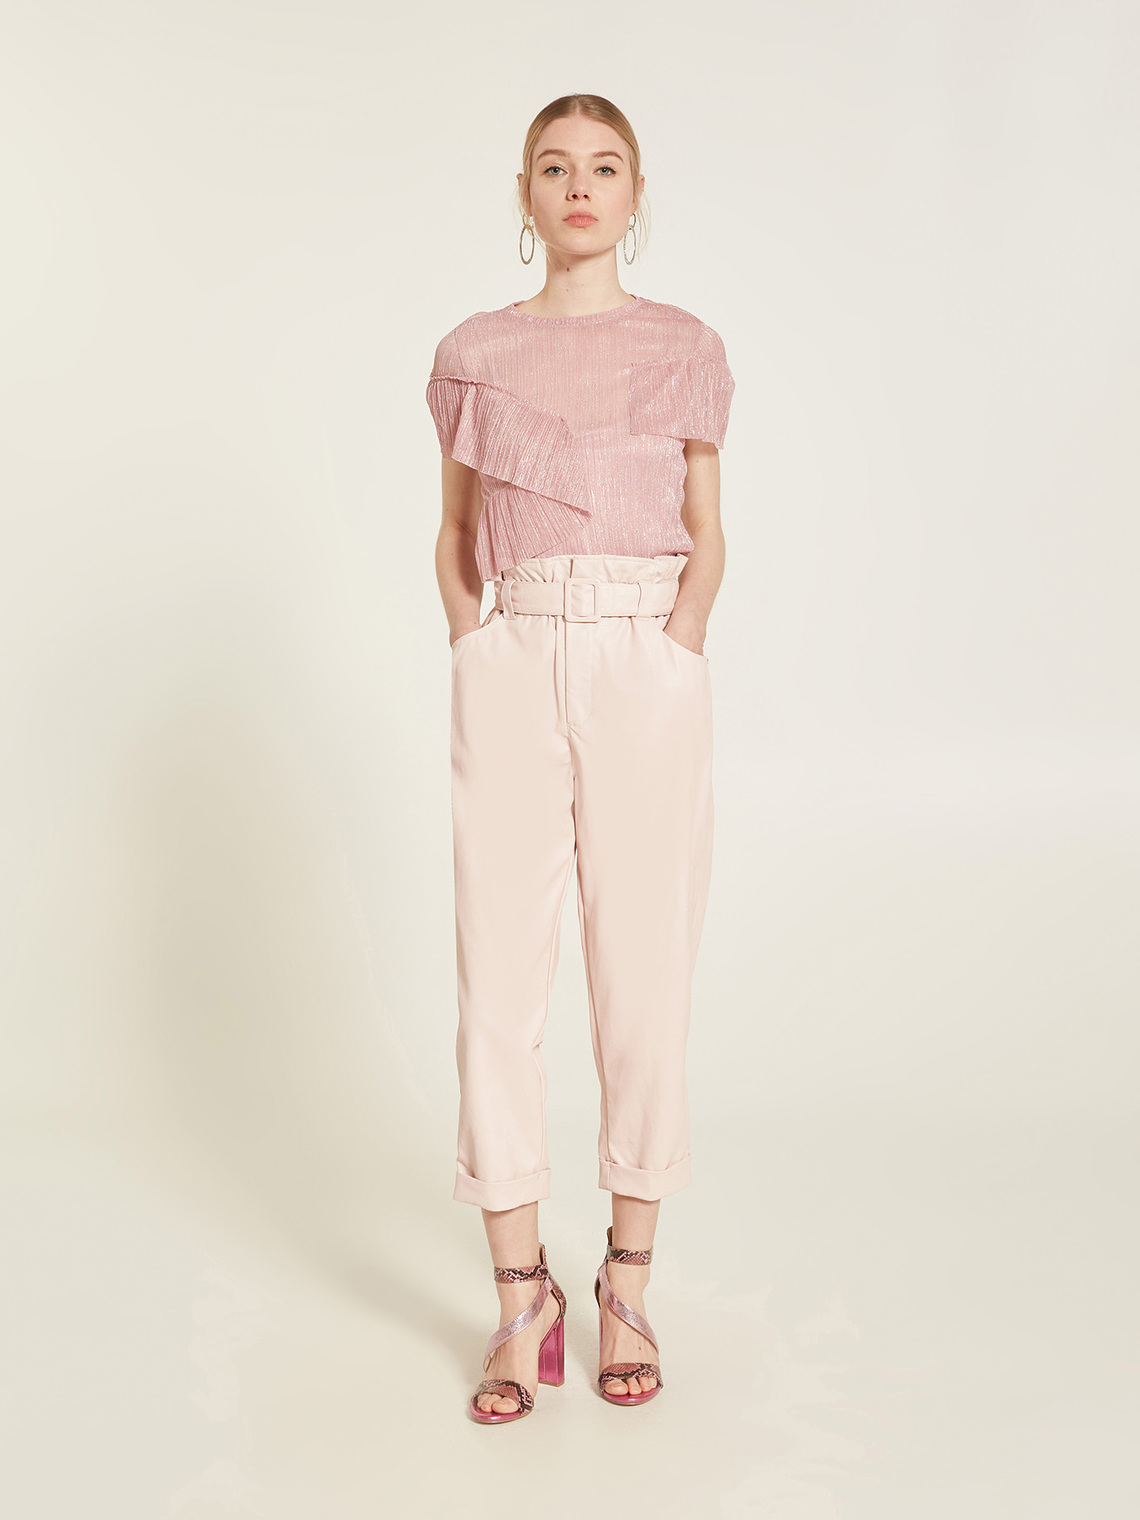 Pantaloni carrot in similpelle e maglia rosa chiaro